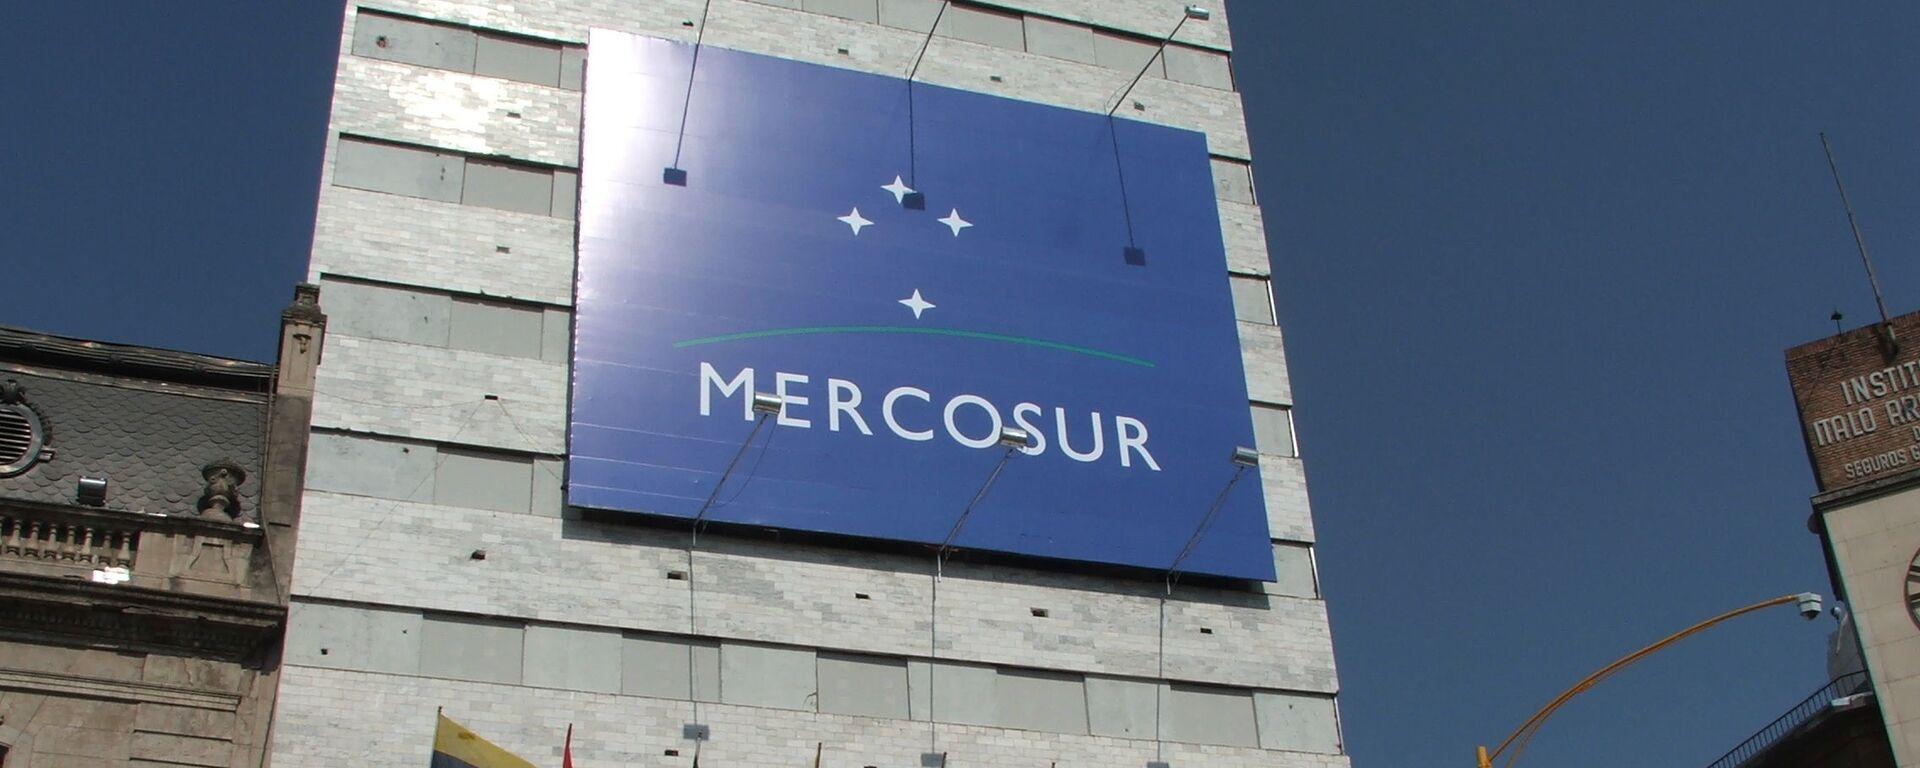 Sede de Mercosur - Sputnik Mundo, 1920, 07.07.2021